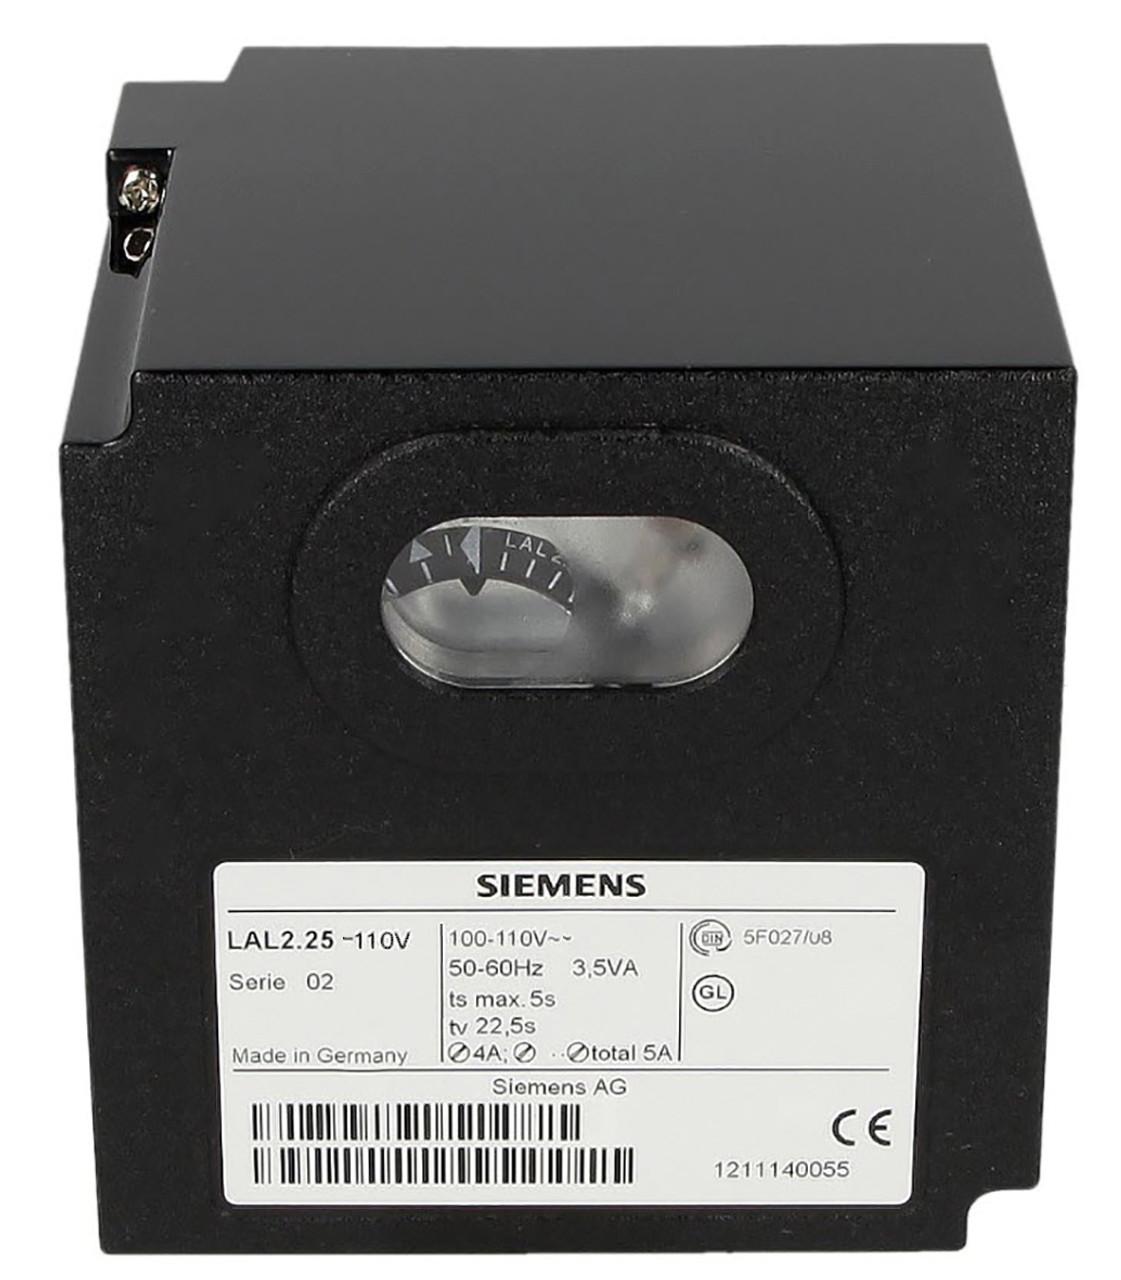 Siemens LAL2.25-110V